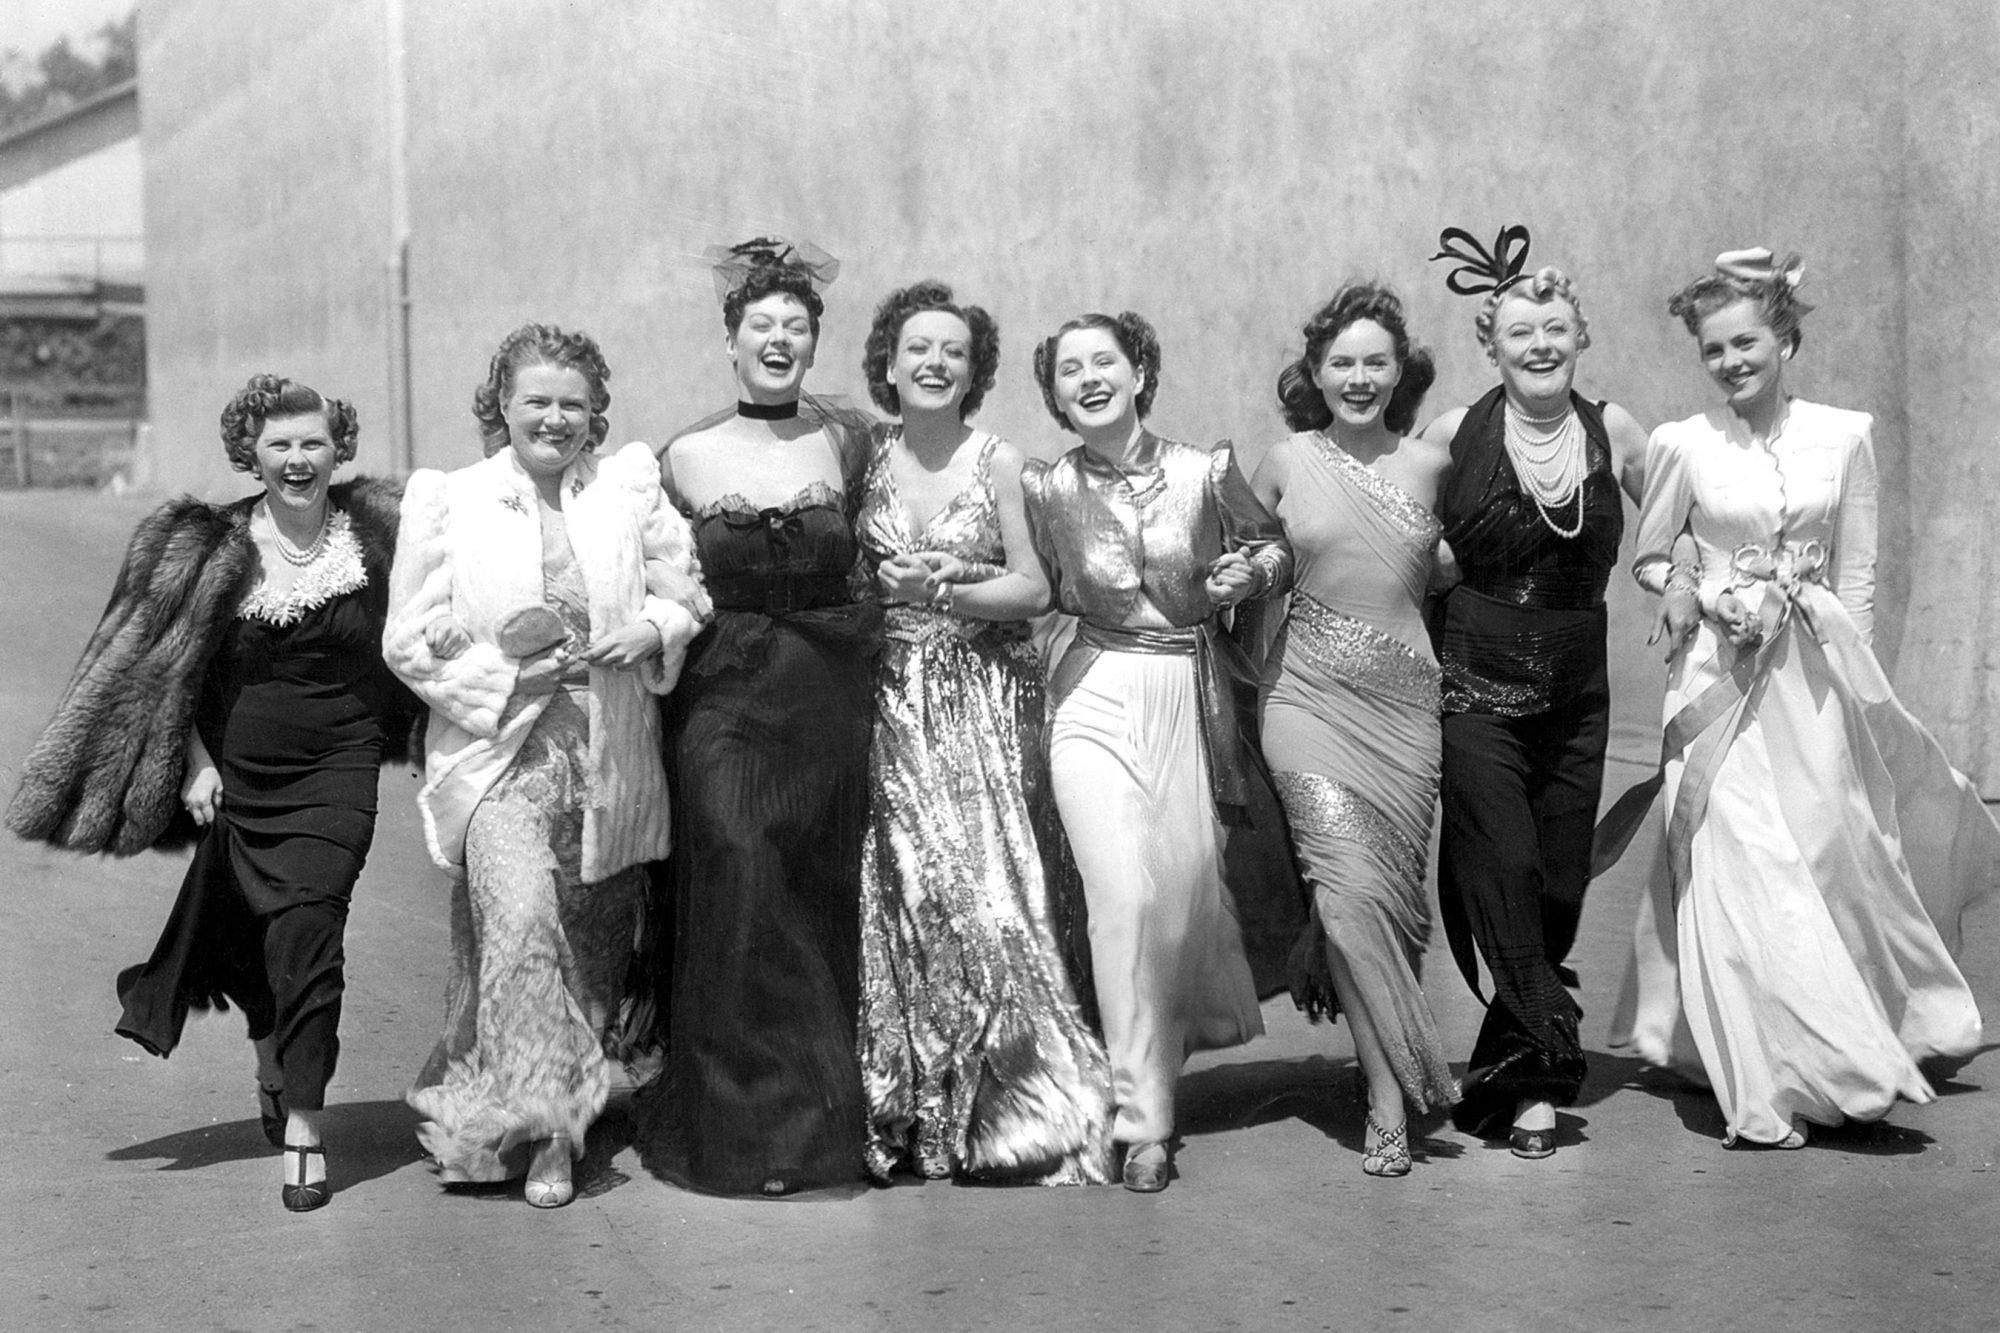 THE WOMEN, Phyllis Povah, Rosalind Russell, Joan Crawford, Norma Shearer, Paulette Goddard, Mary Bol